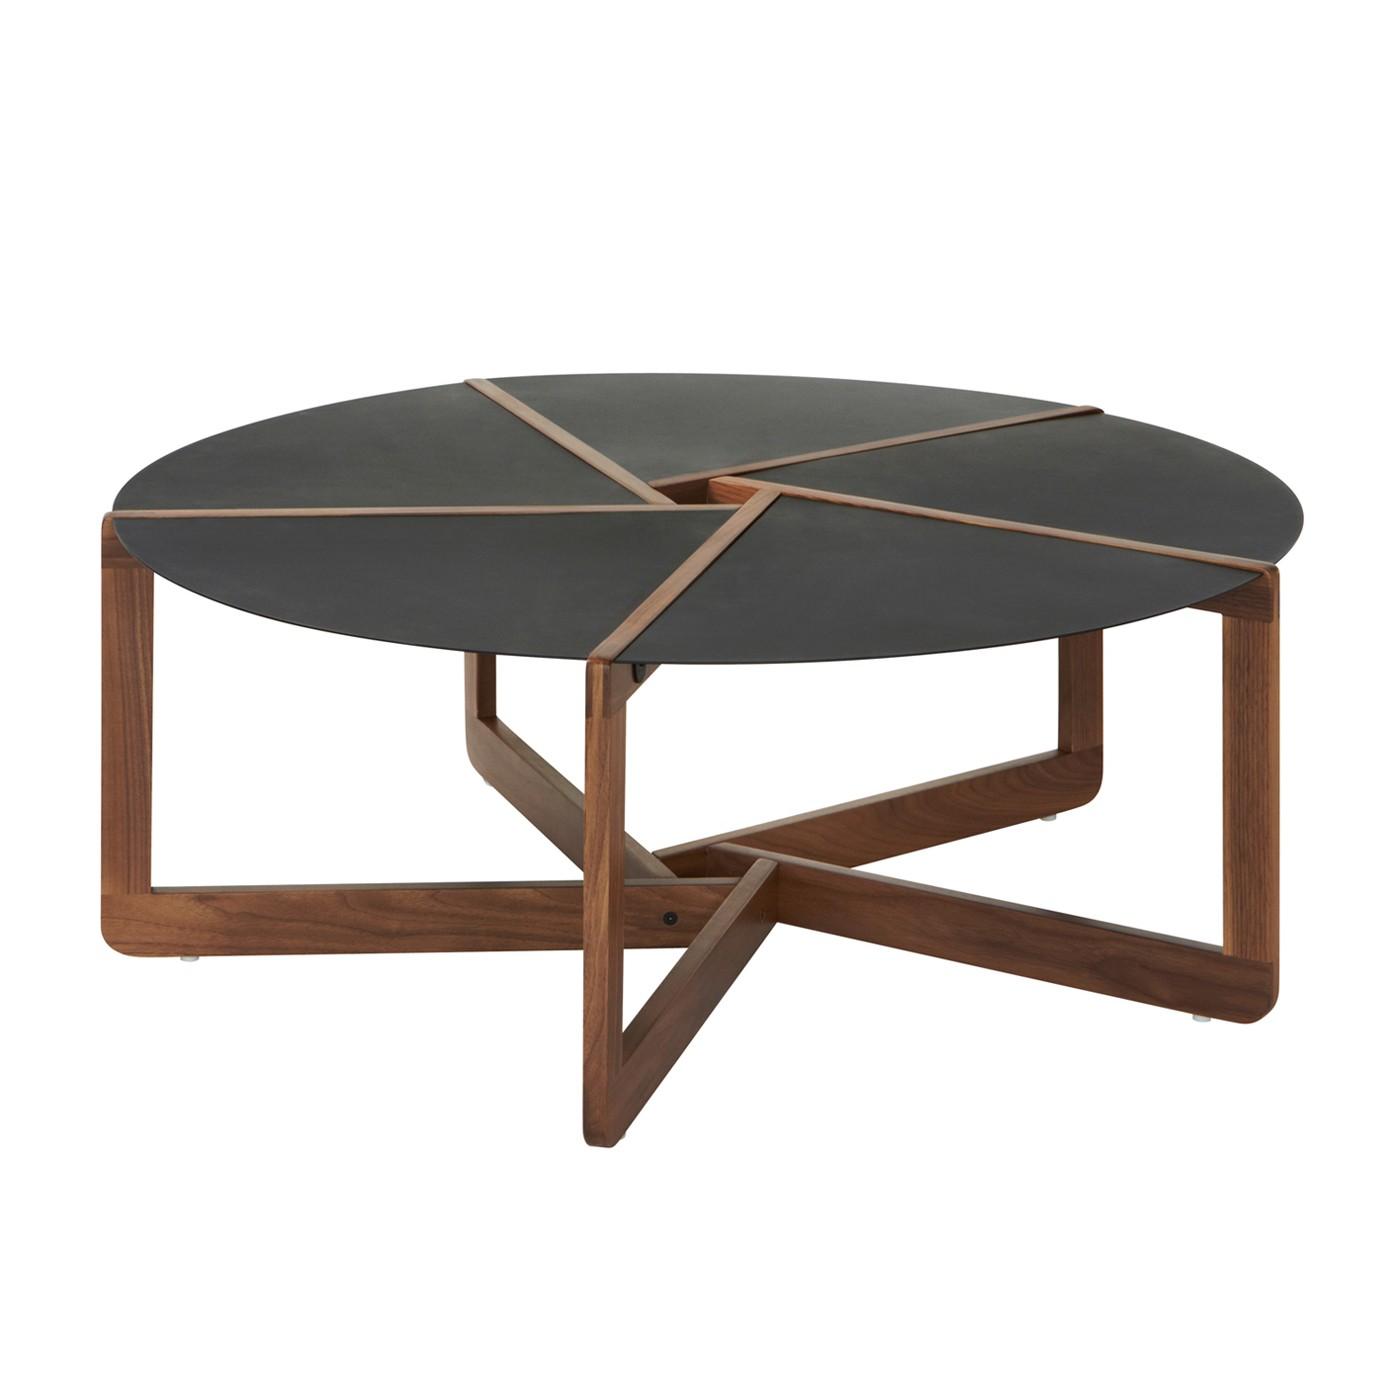 lienzoelectronico Coffee Table